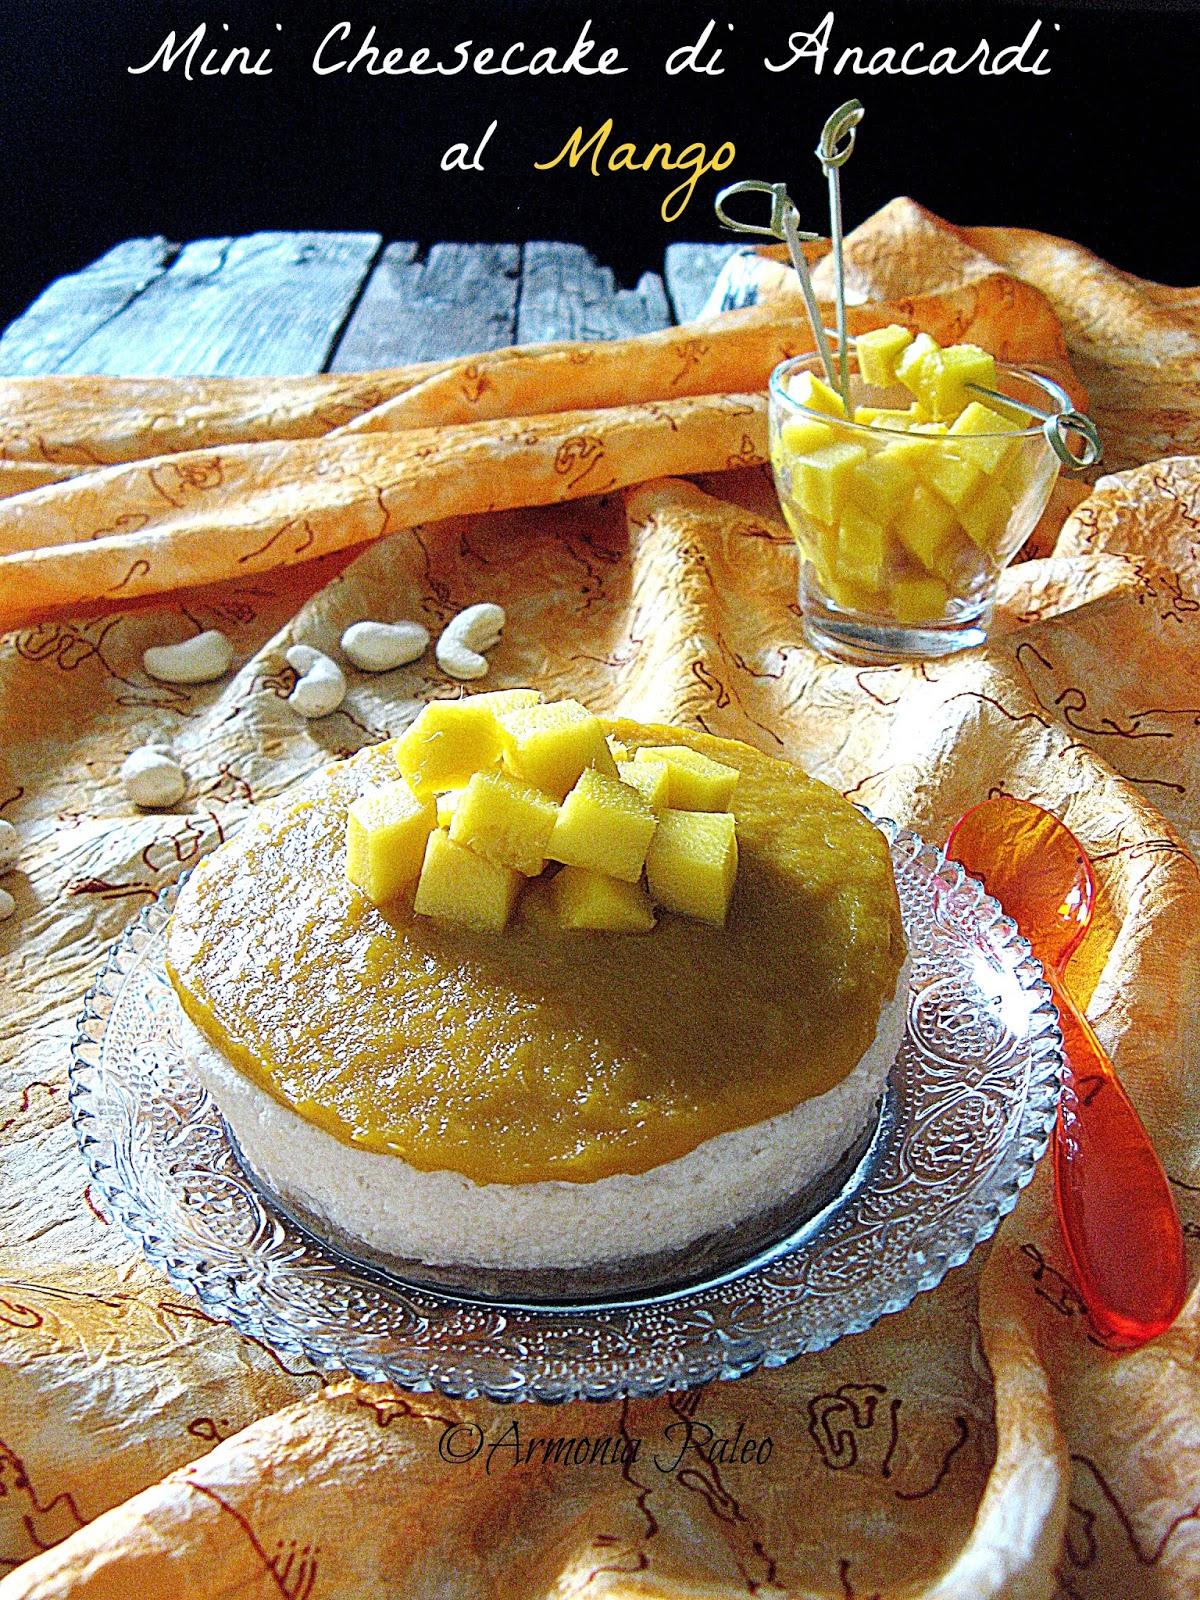 Mini Cheesecake di Anacardi al Mango di Armonia Paleo